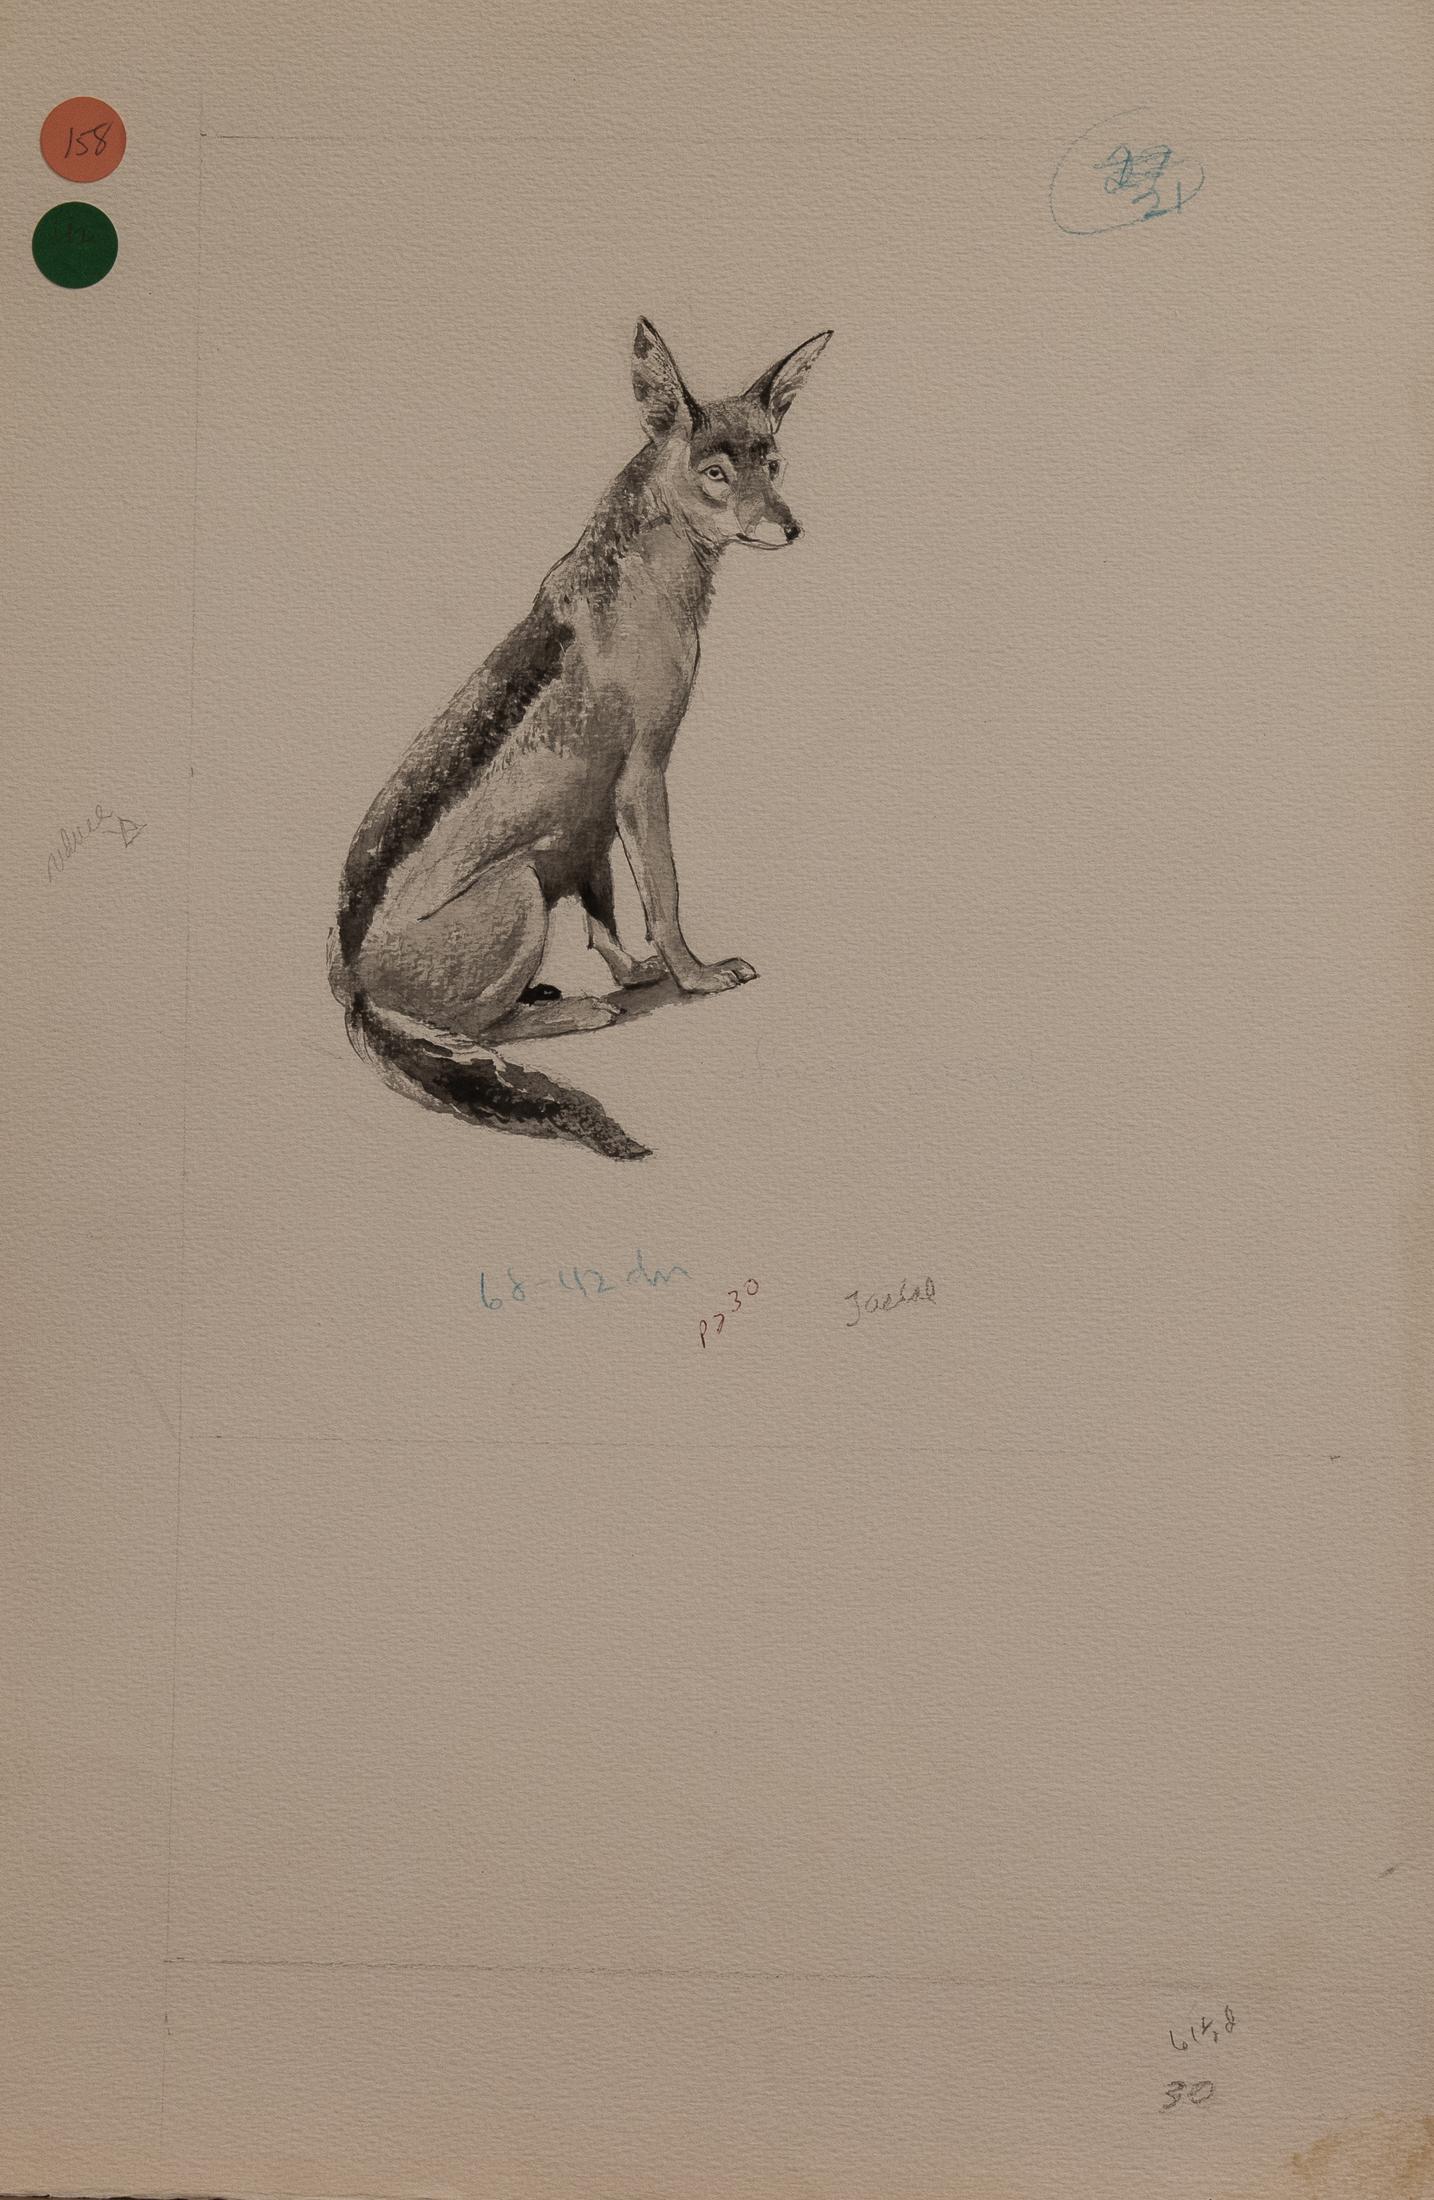 jackal (1 of 1)